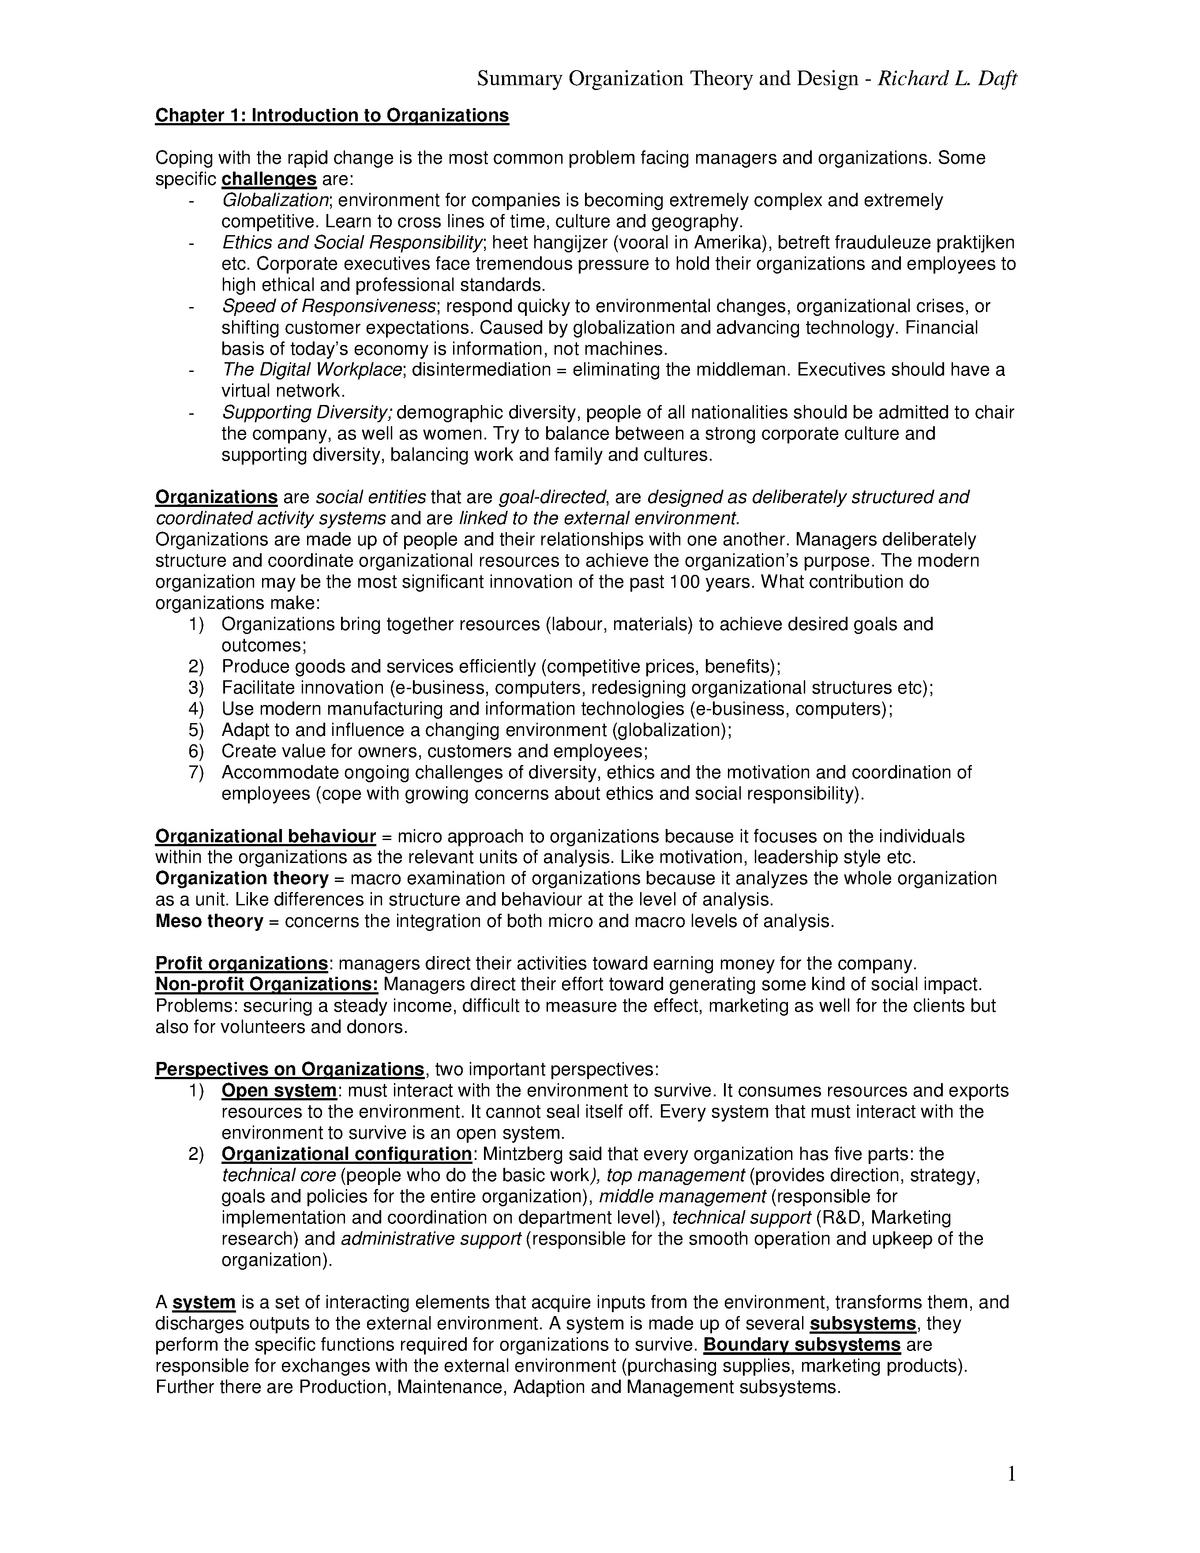 Summary Organization Theory and Design, Richard L  Daft